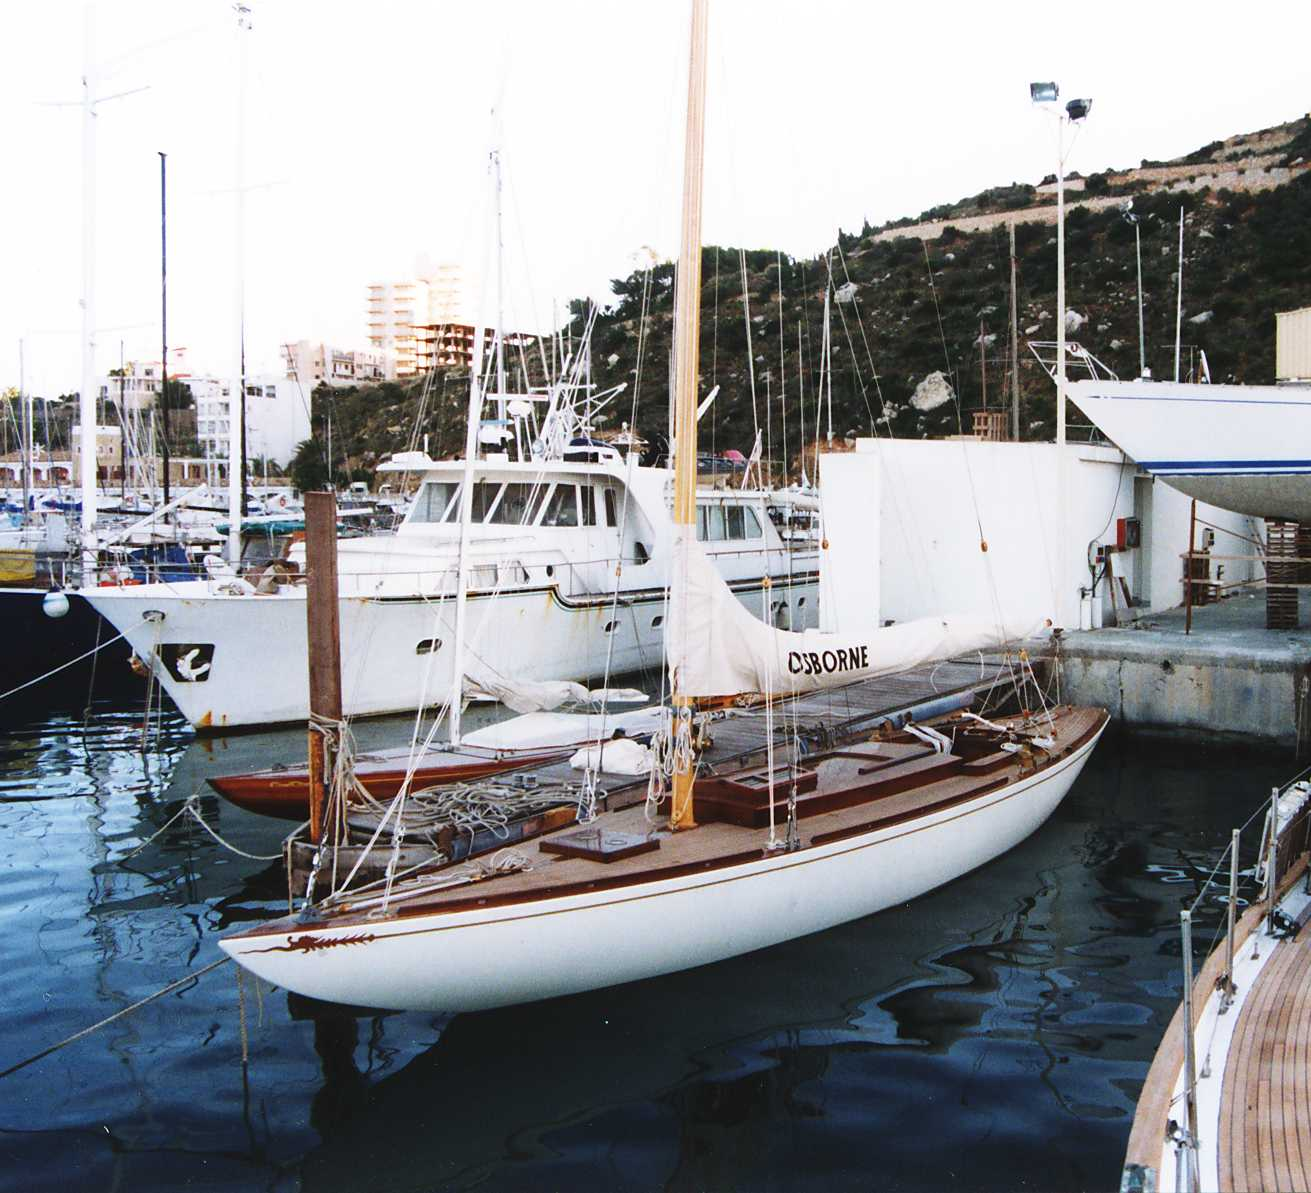 Osborne following her restoration at Fairlie Yachts